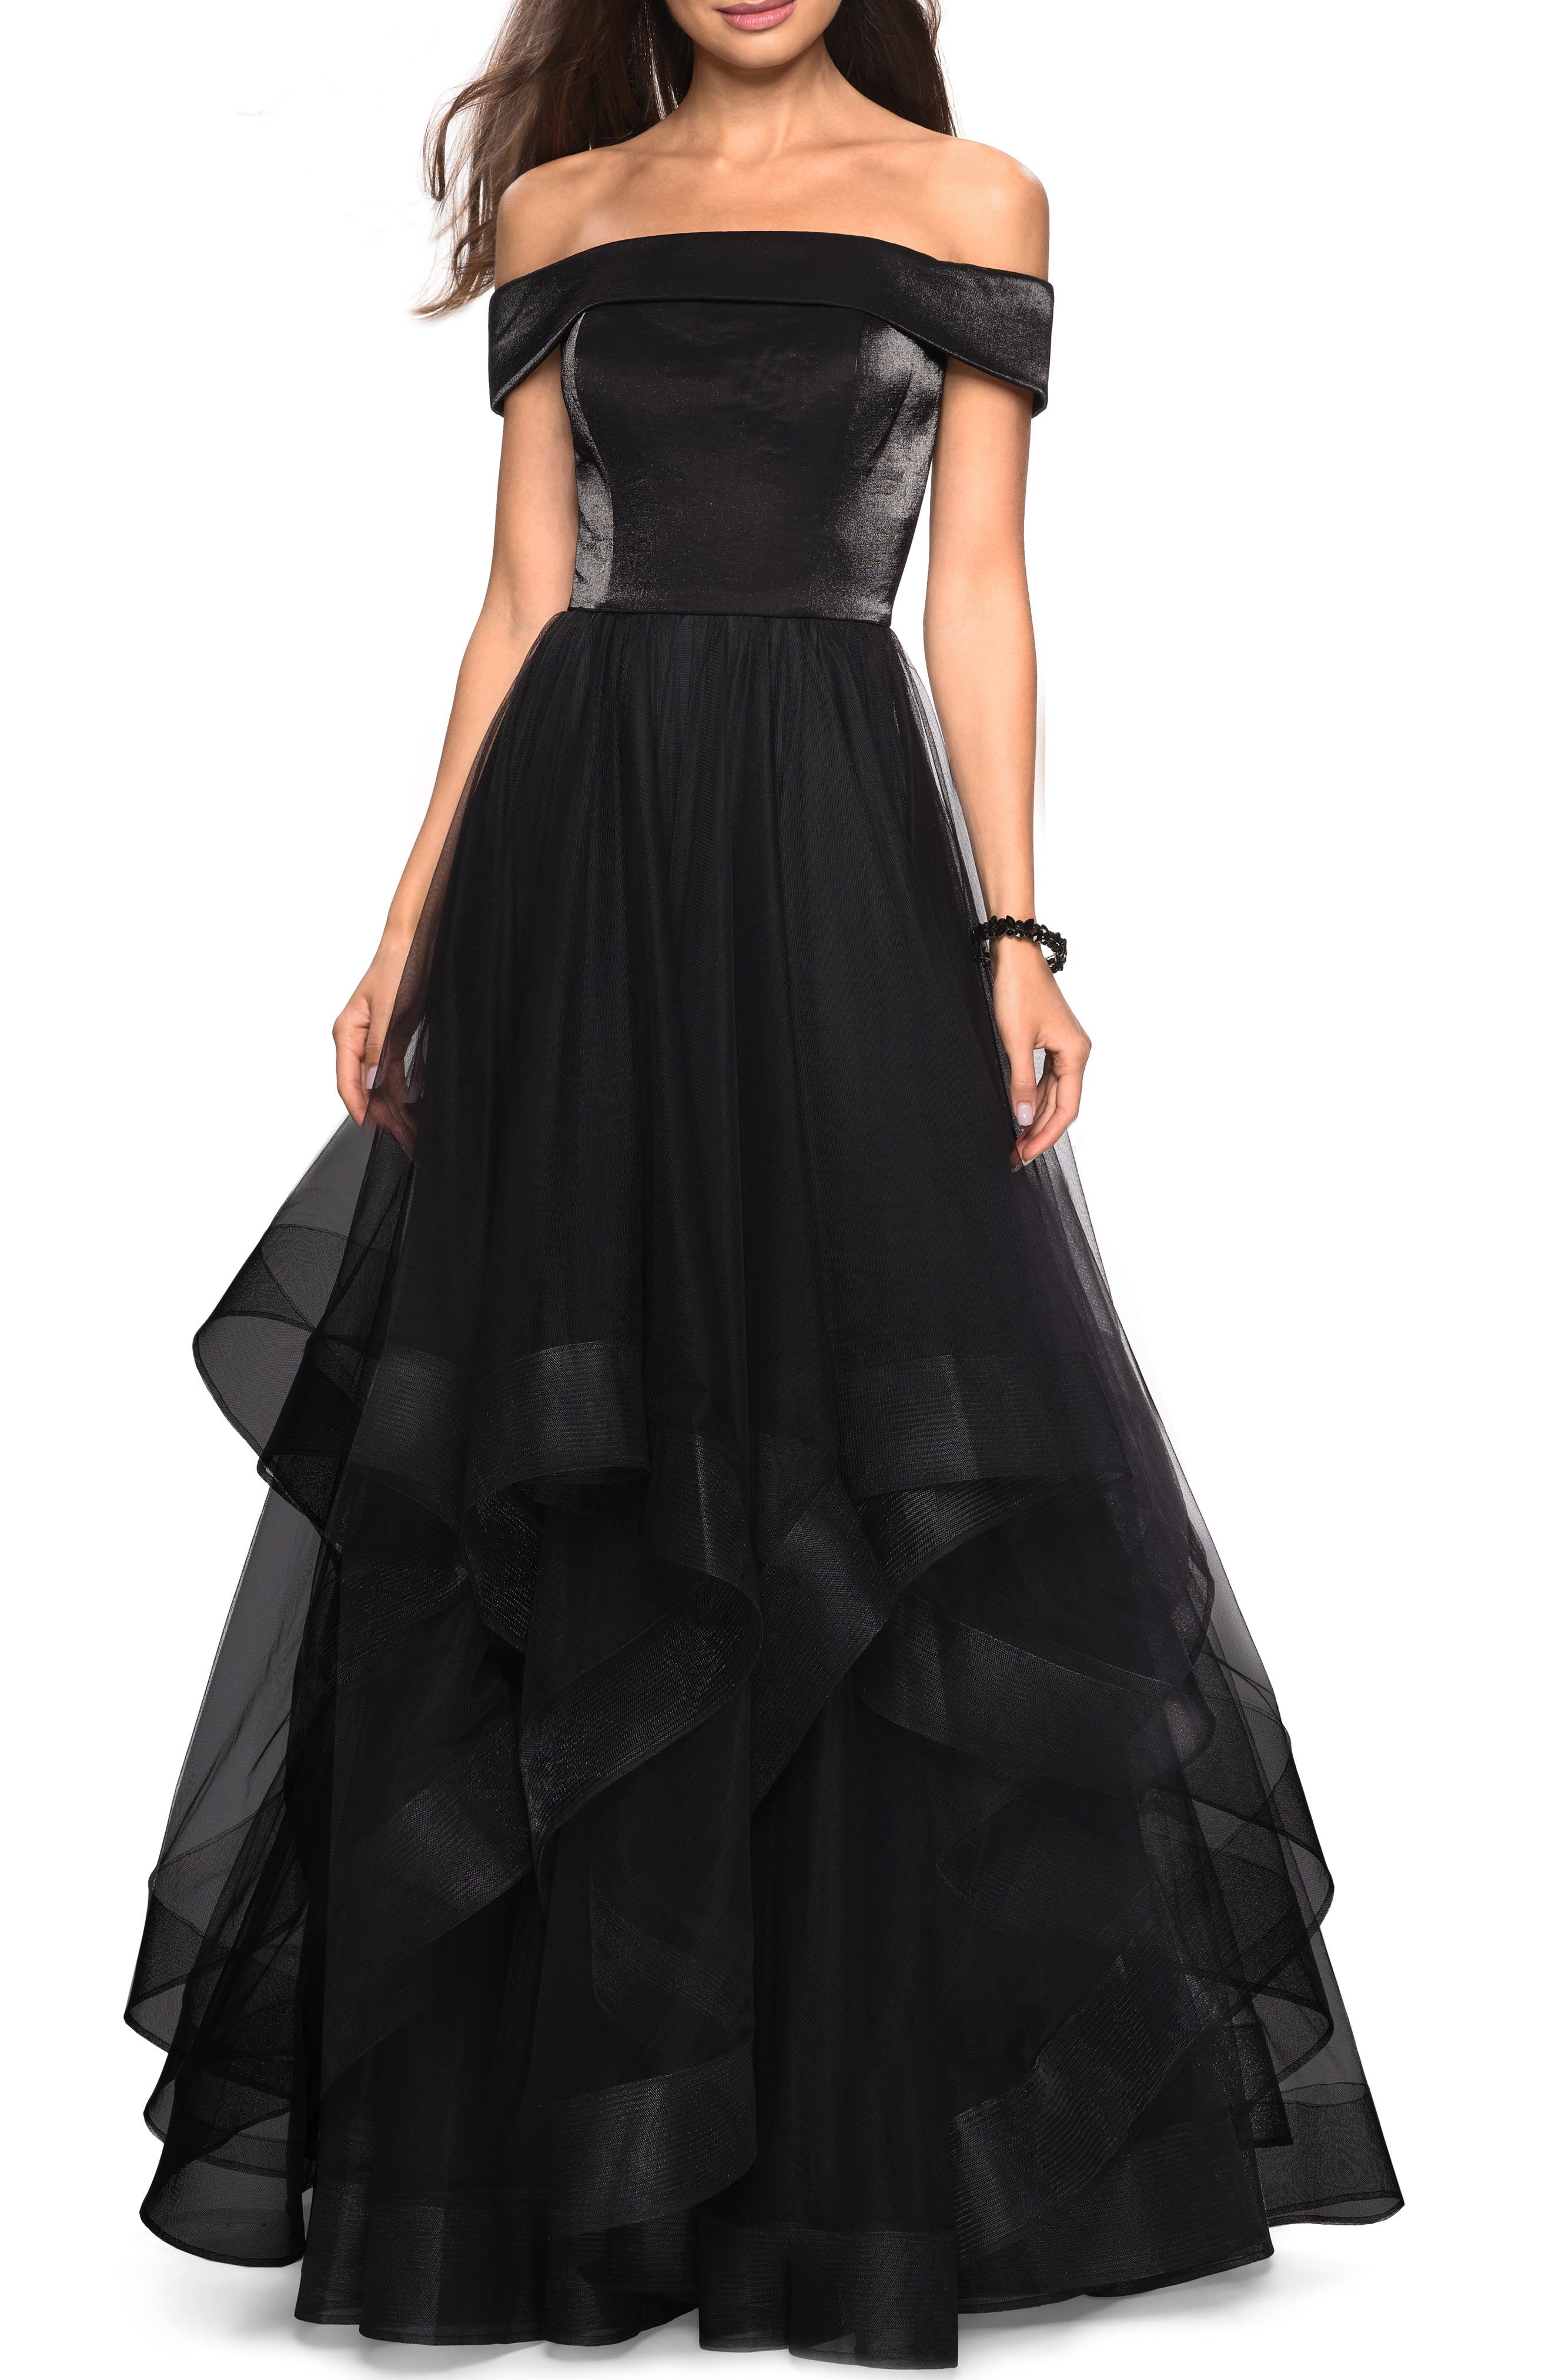 LA FEMME, Off the Shoulder Evening Dress, Main thumbnail 1, color, BLACK